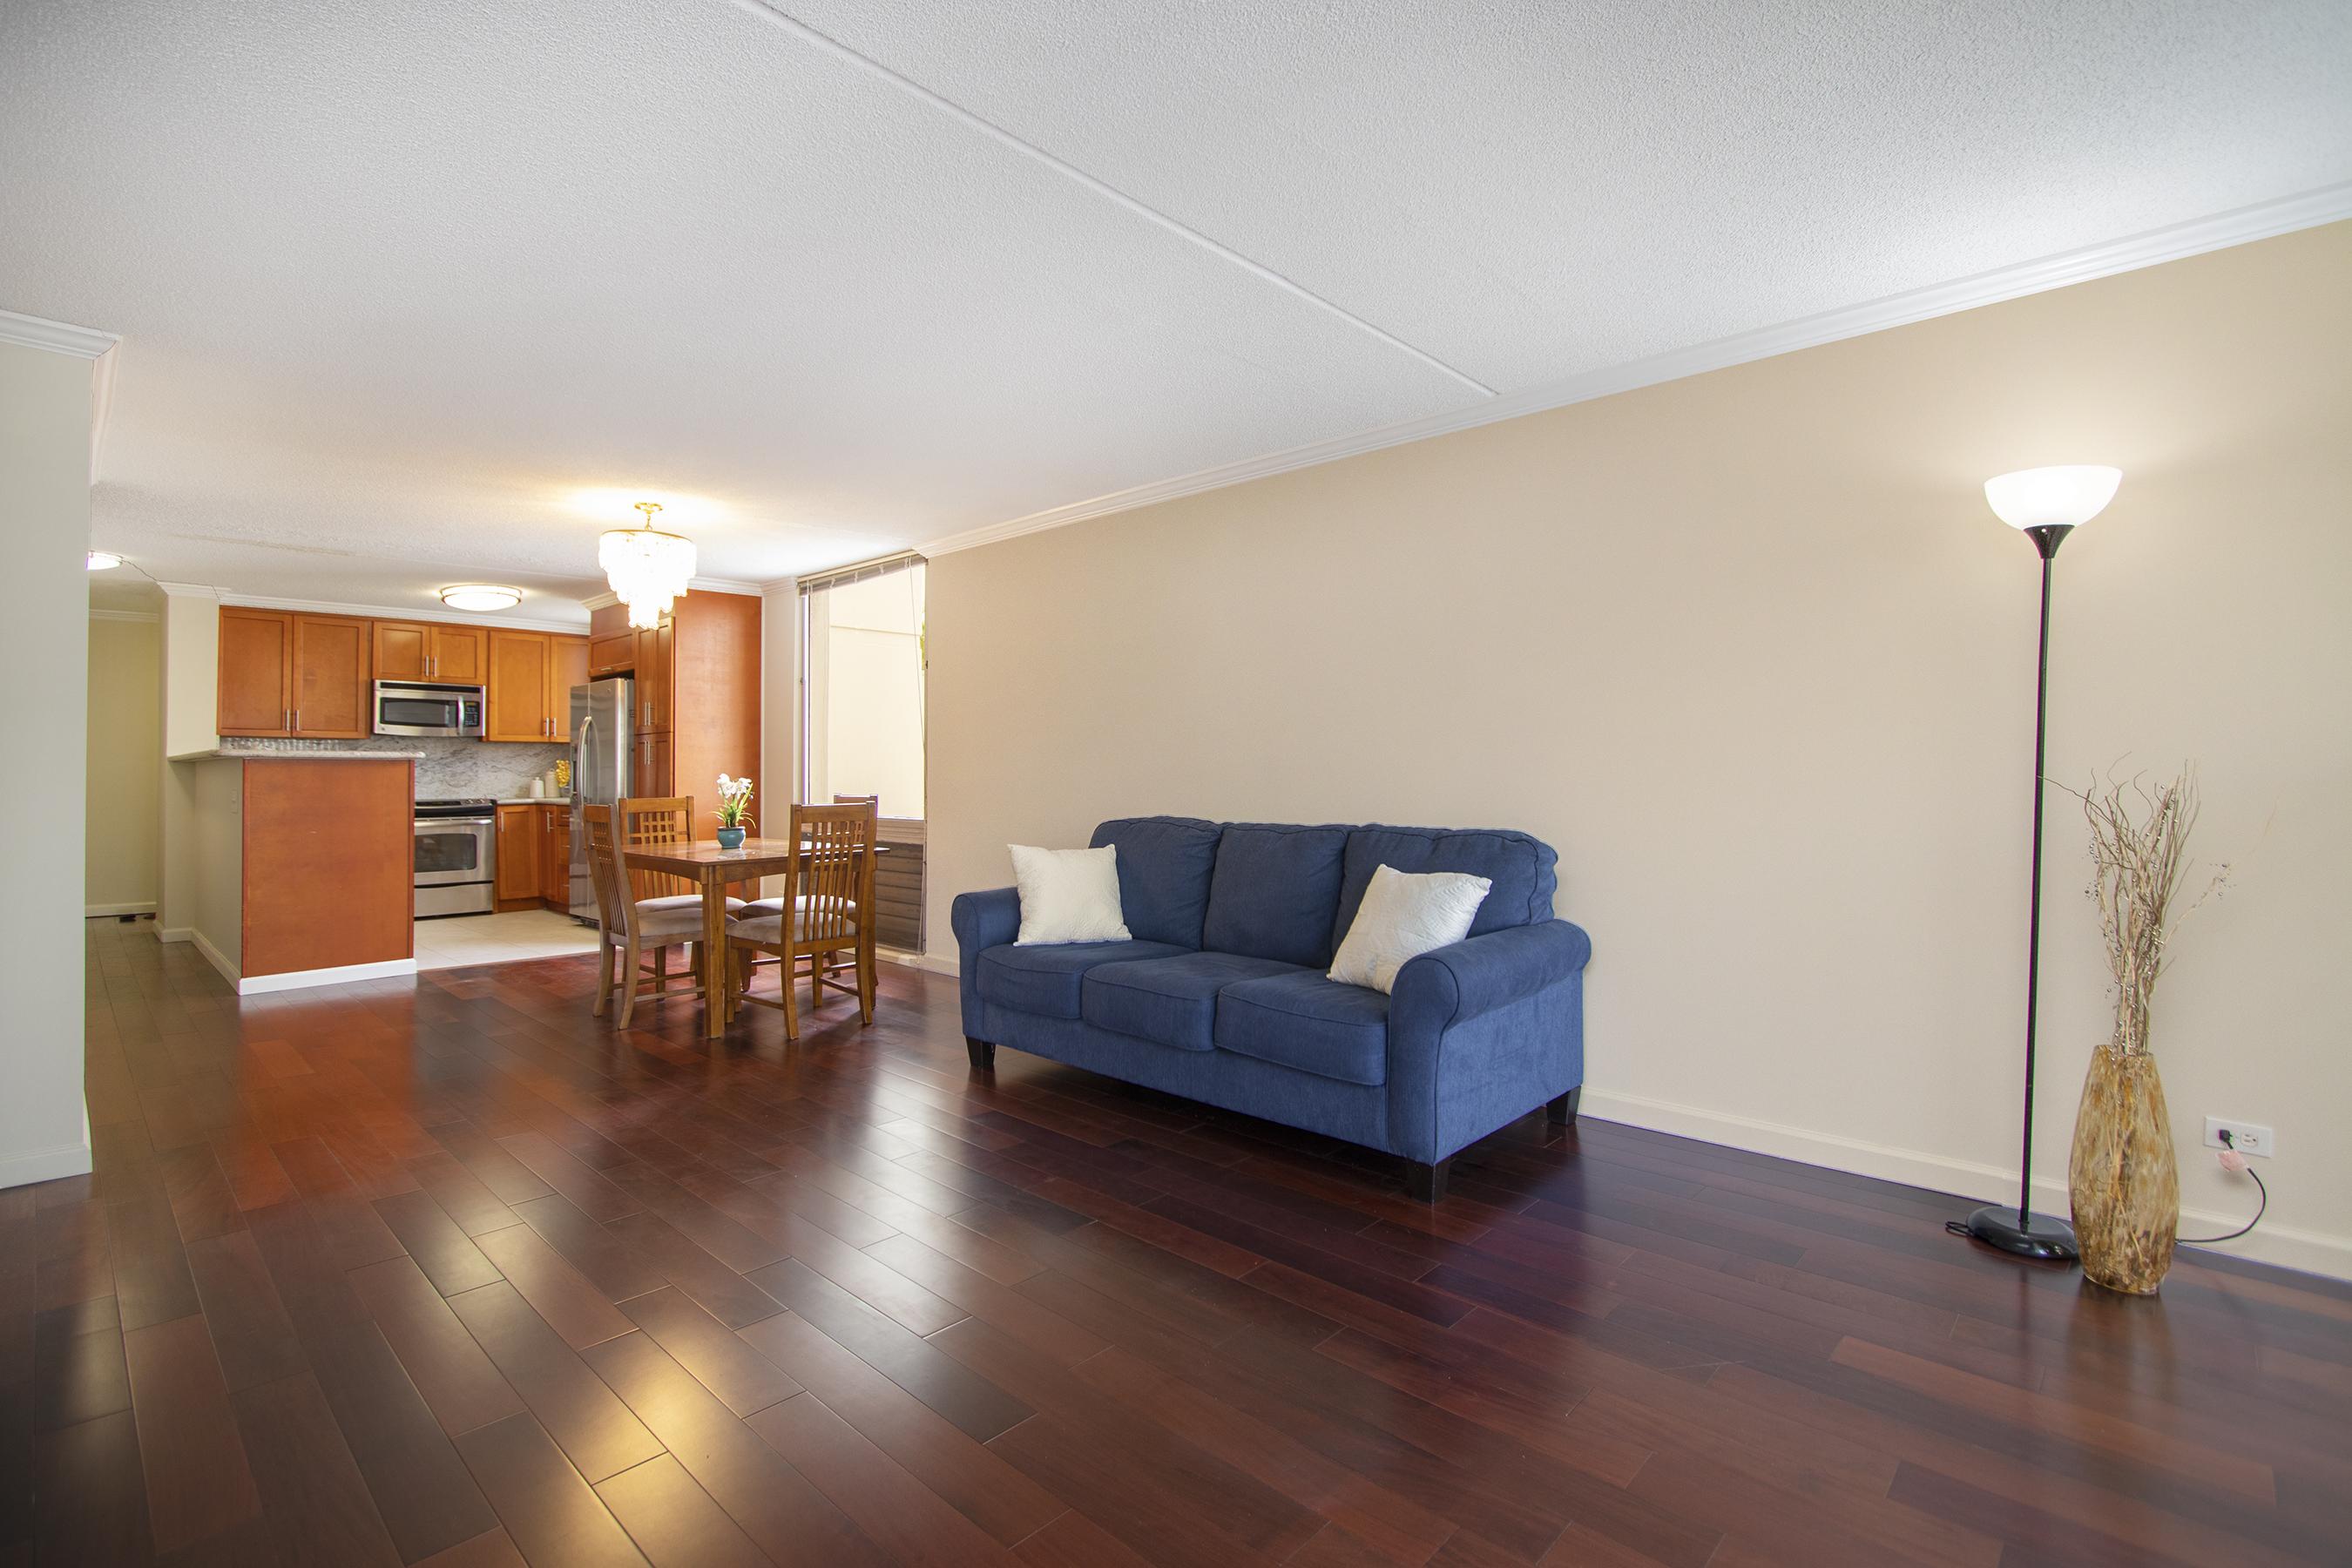 Living Room 1 at 1717 Ala Wai Boulevard #510